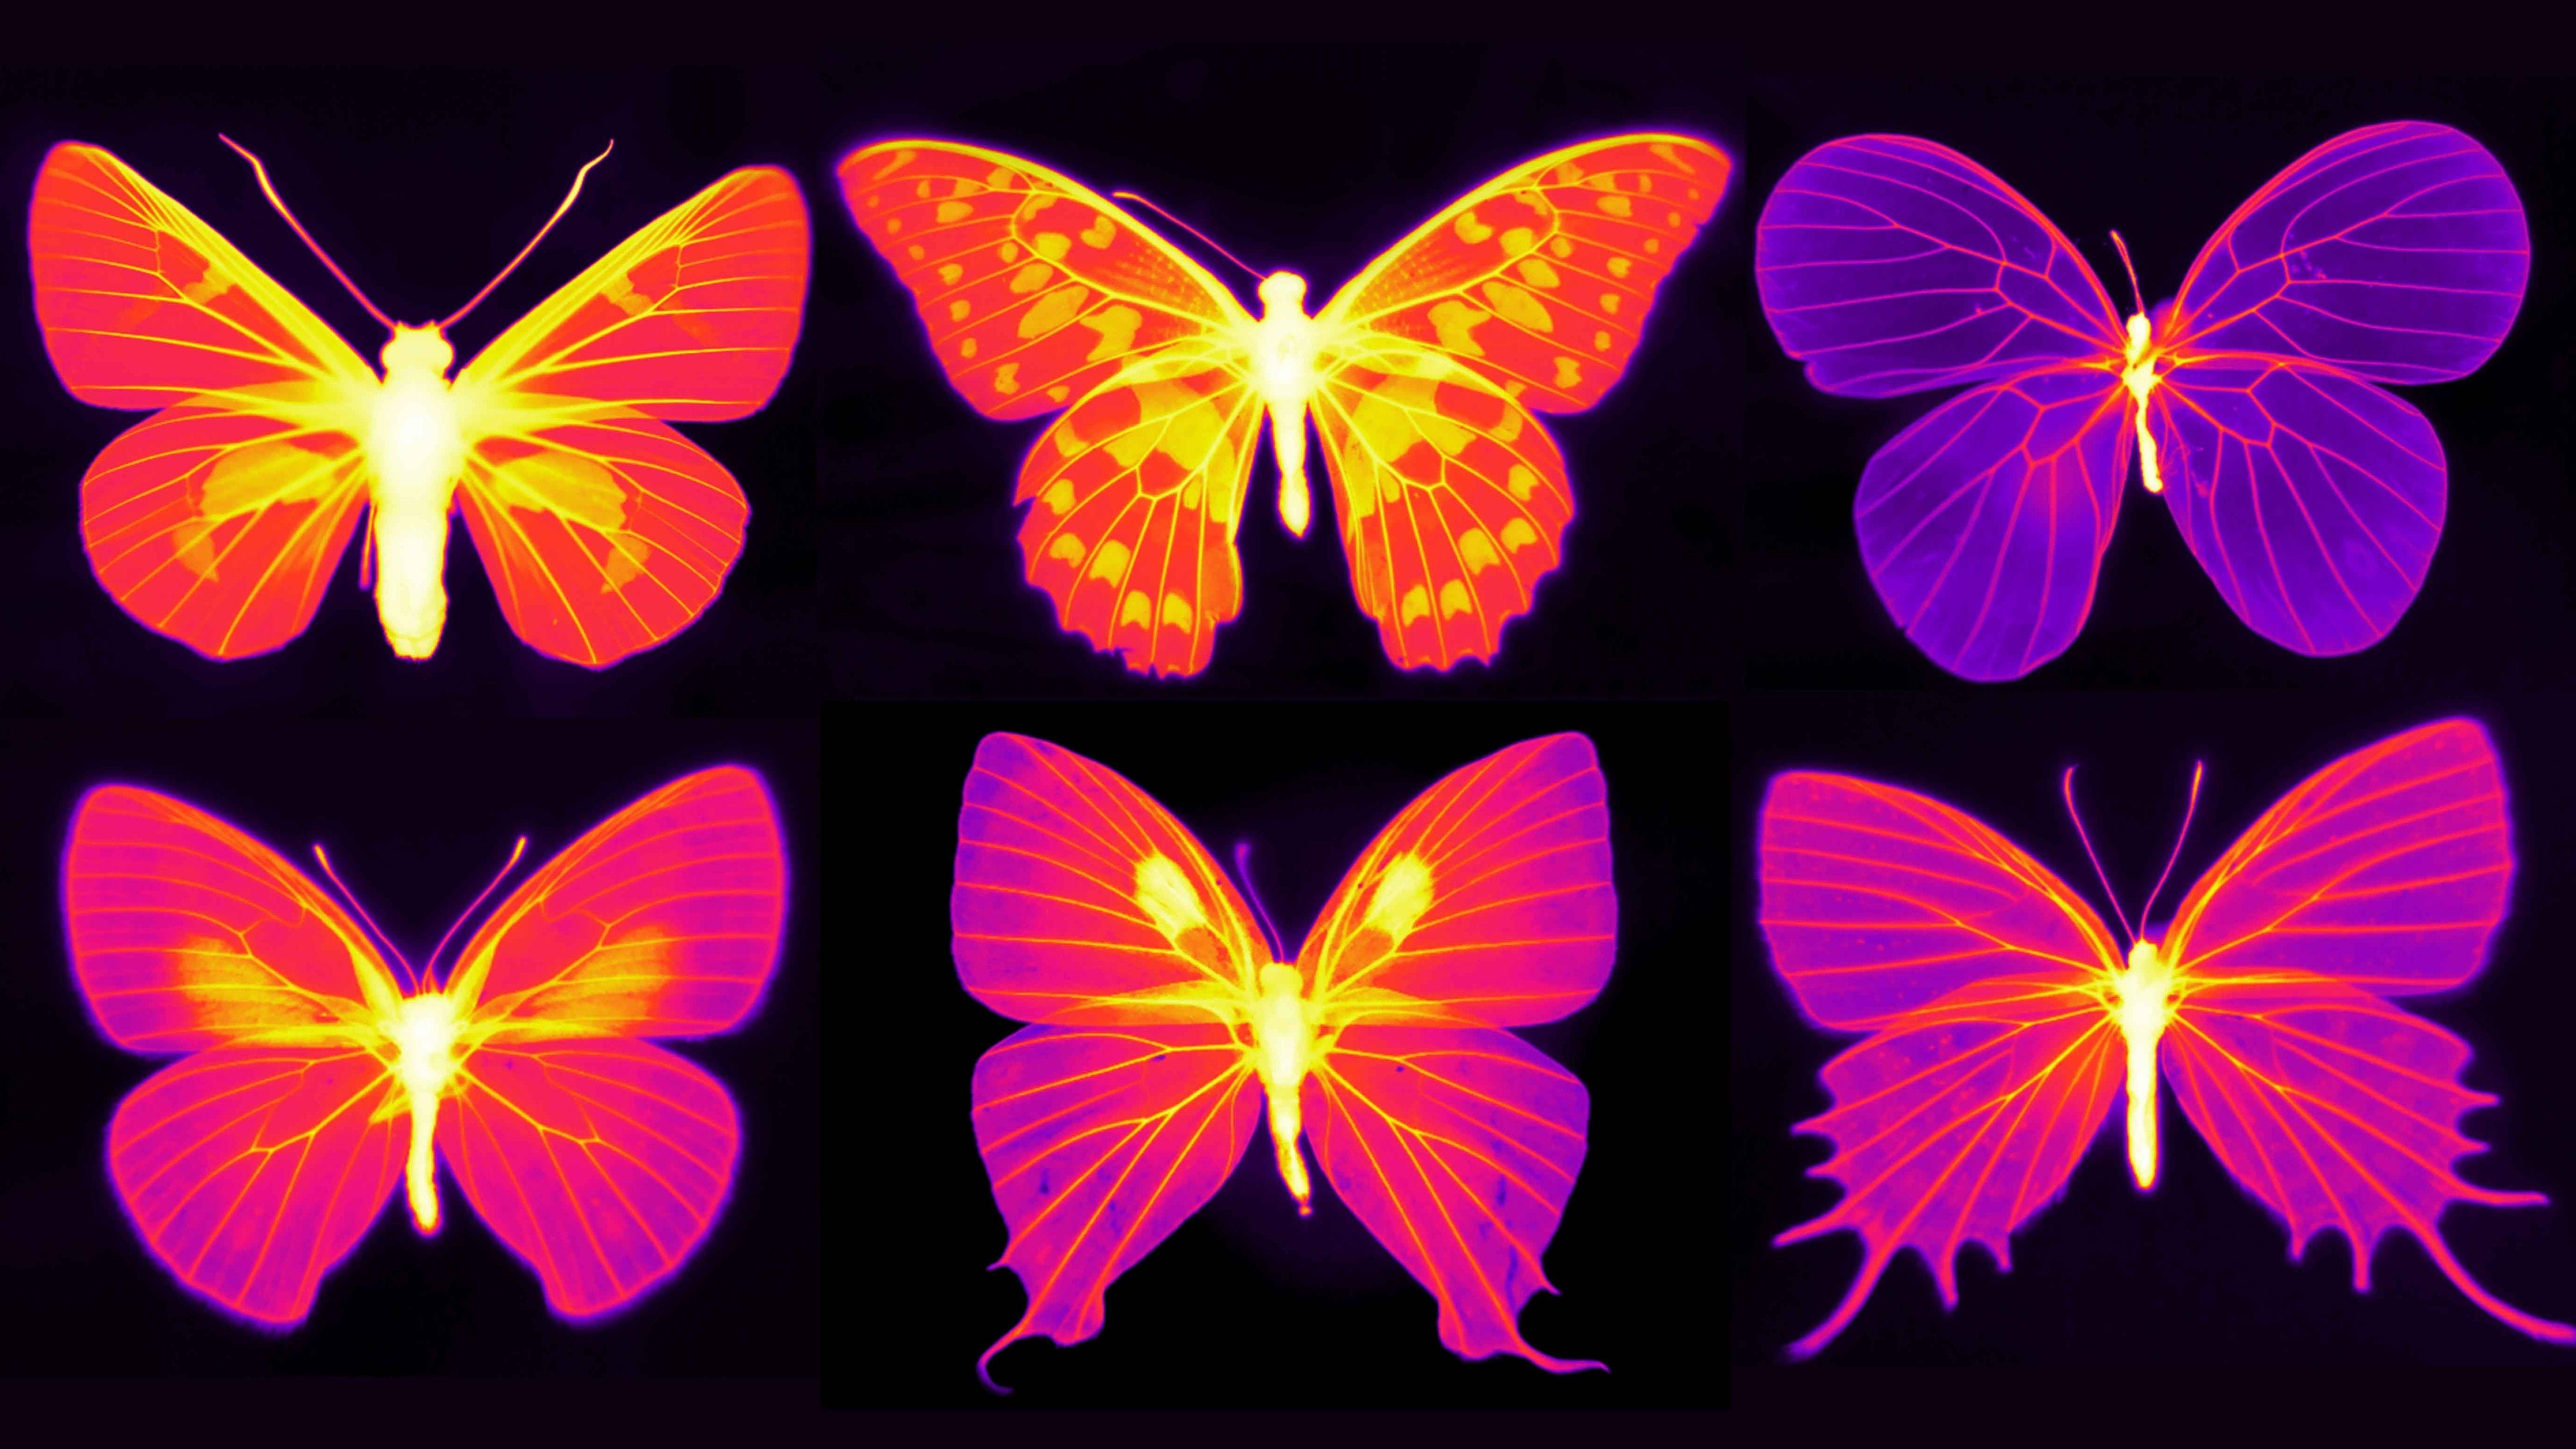 Schmetterlingsflügel unter Infrarotlicht